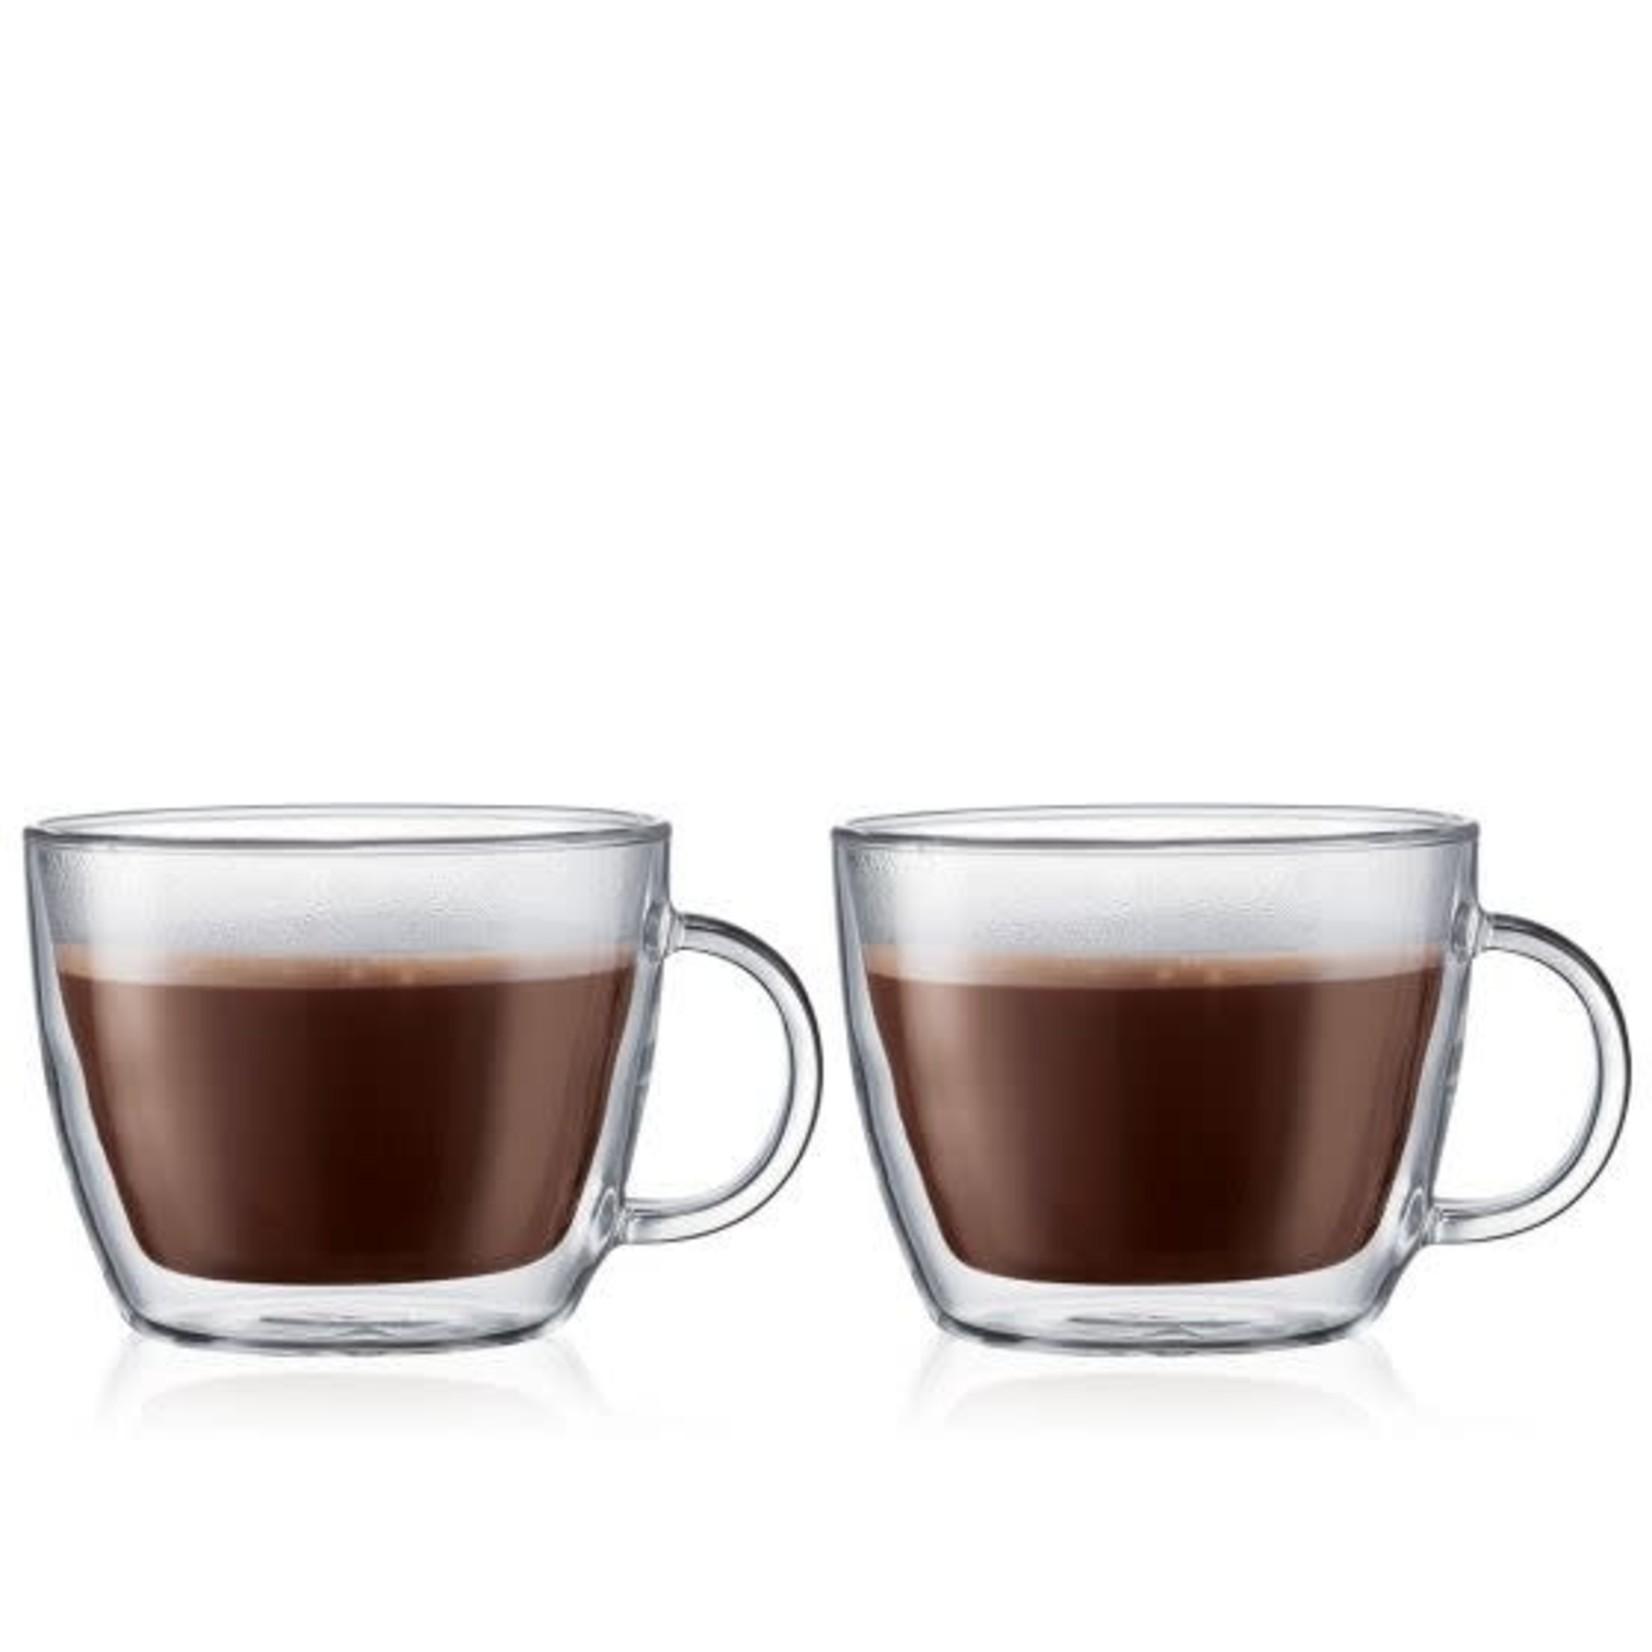 Bodum Bodum BISTRO Cafe Latte Cup 15oz